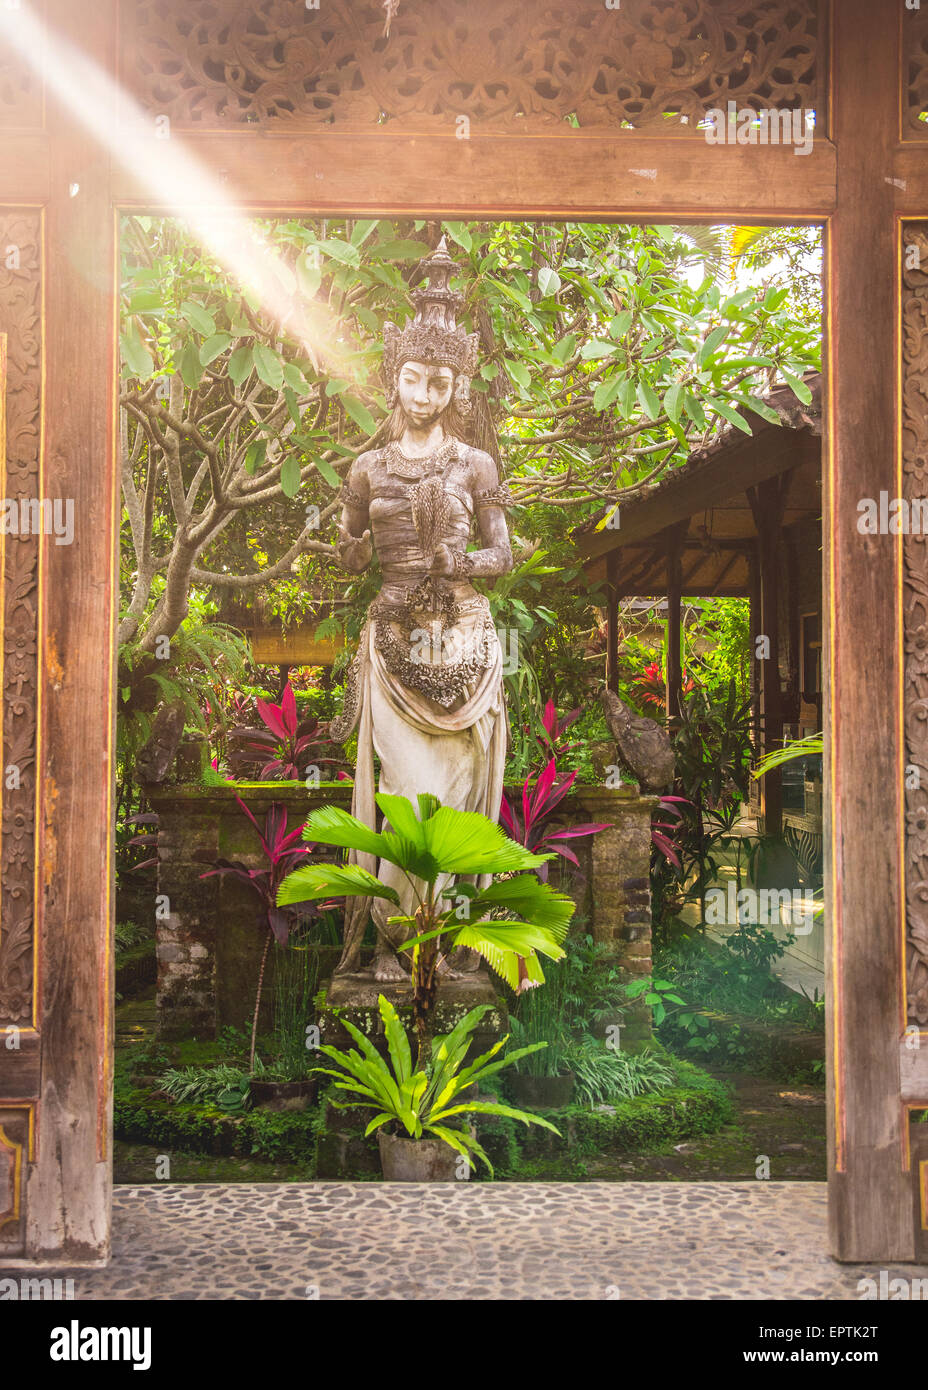 Goddess Welcome Statue In Garden Stock Photos & Goddess Welcome ...